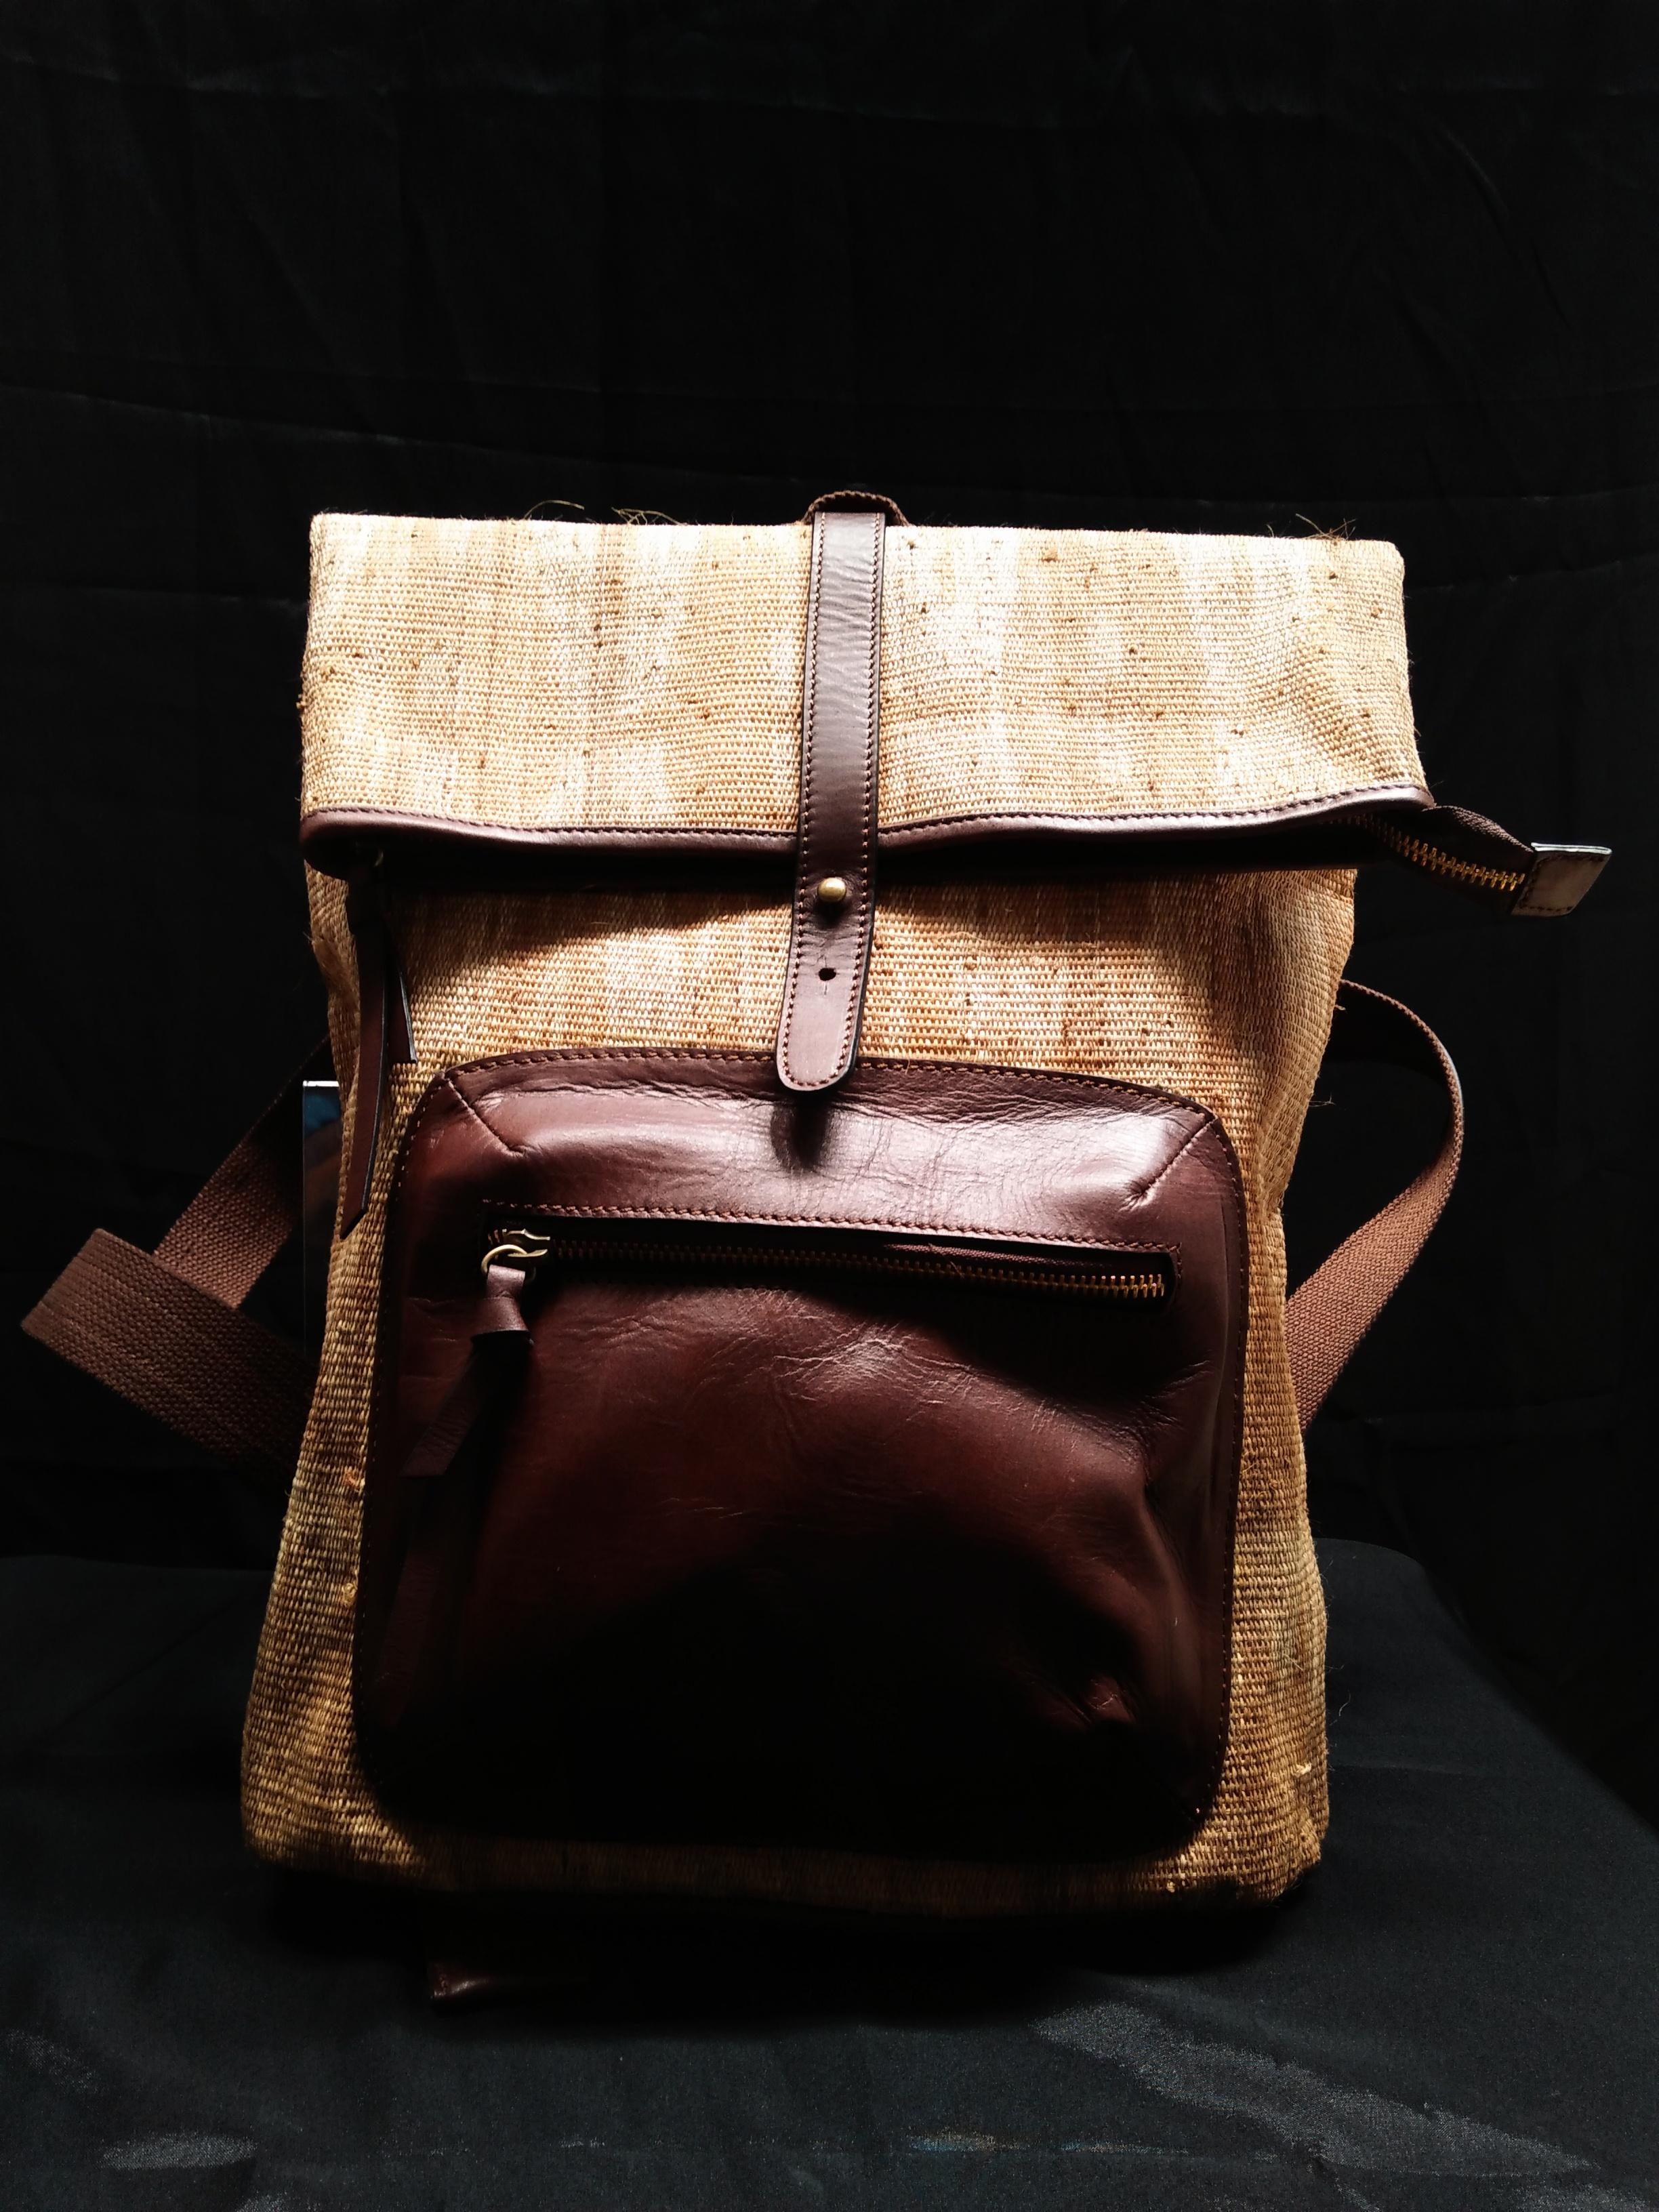 Doyo Ransel Bag 02 - Ikat